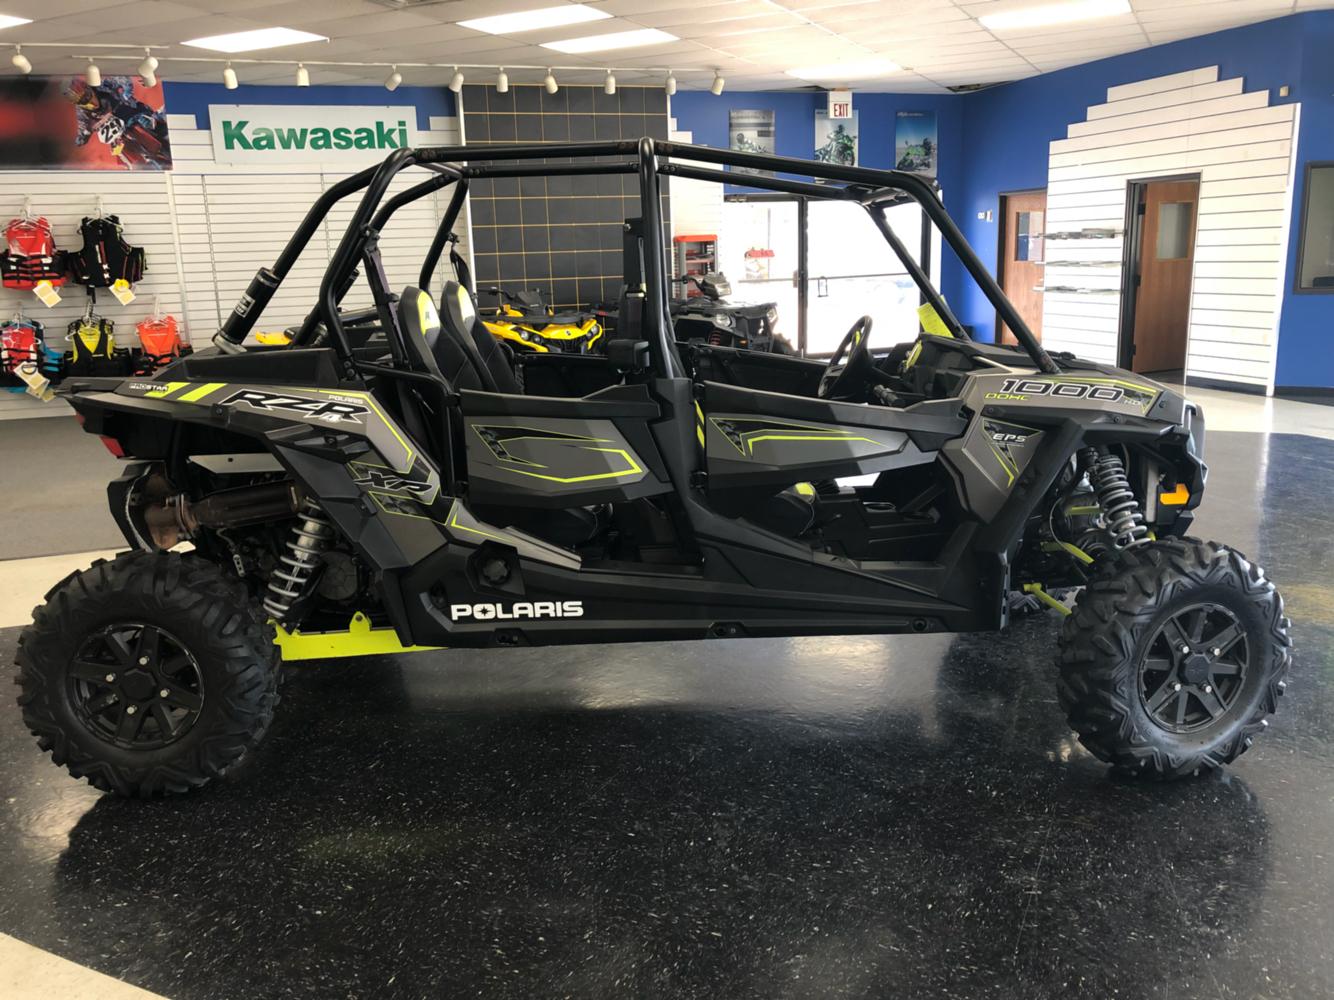 2016 Polaris Rzr Xp 4 1000 Eps In Broken Arrow Oklahoma